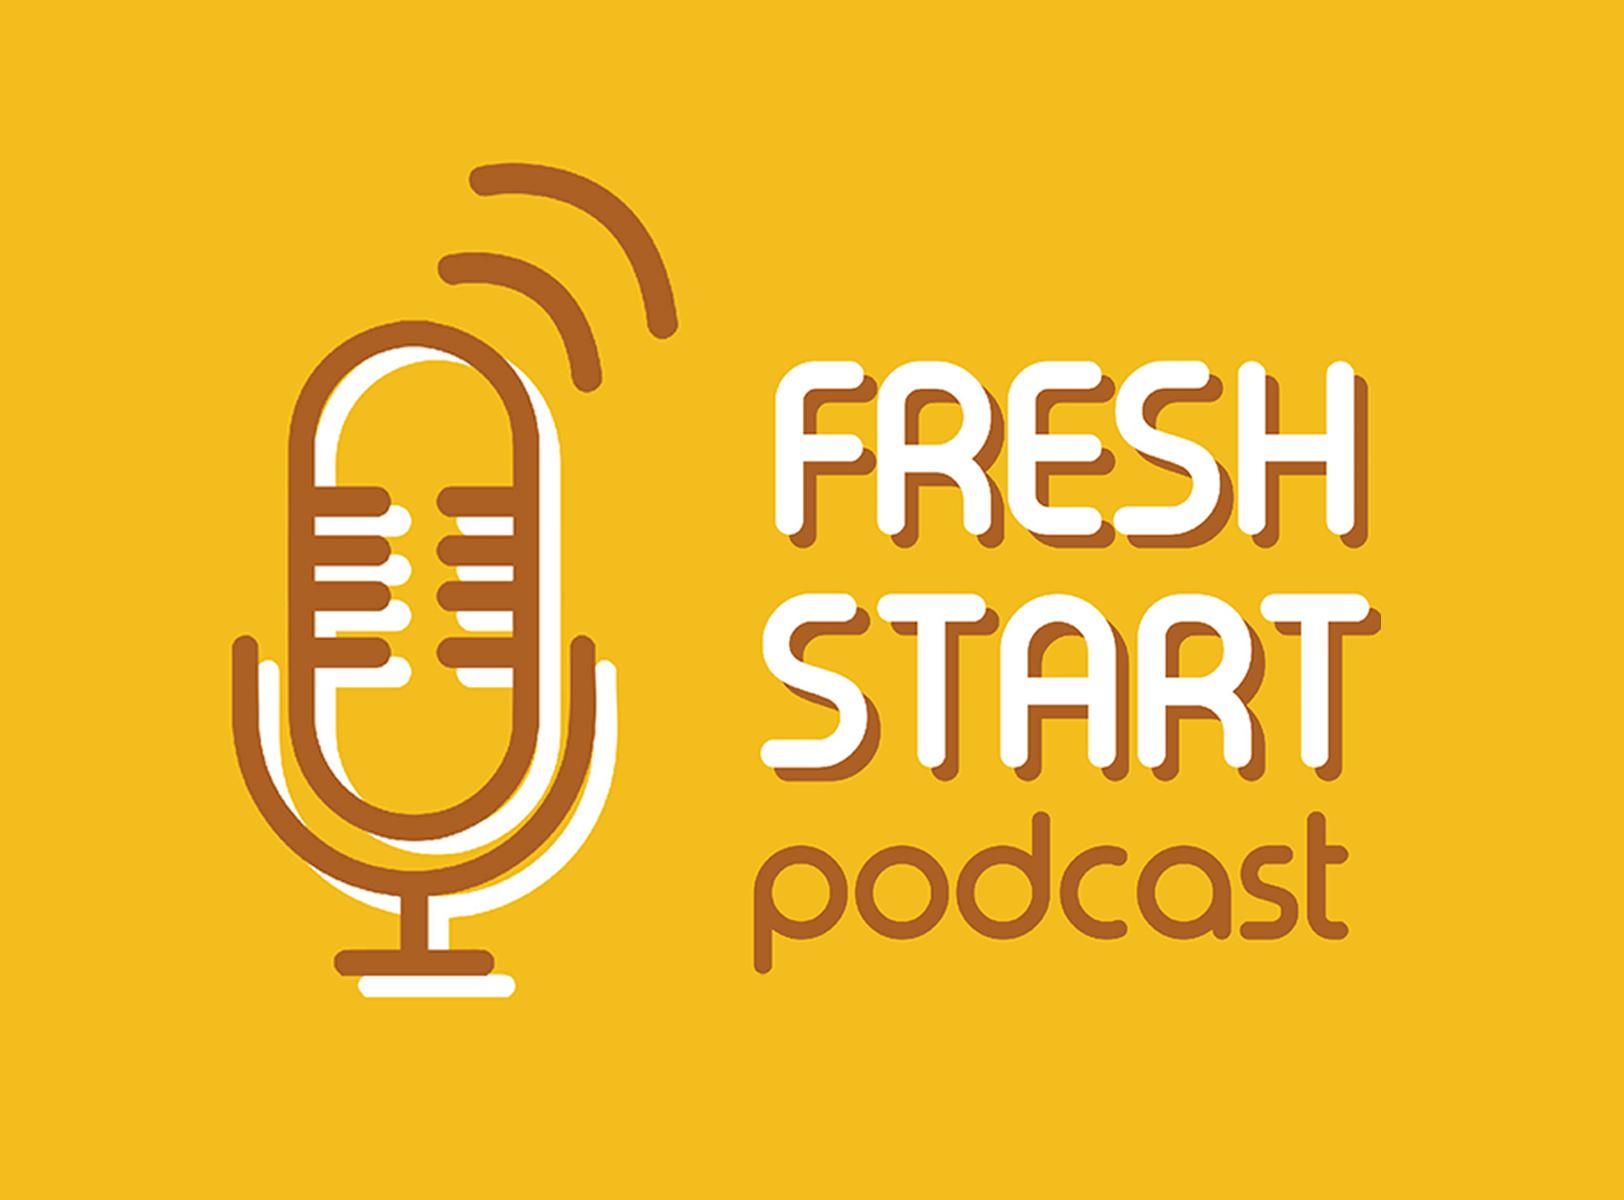 Fresh Start: Podcast News (2/27/2019 Wed.)